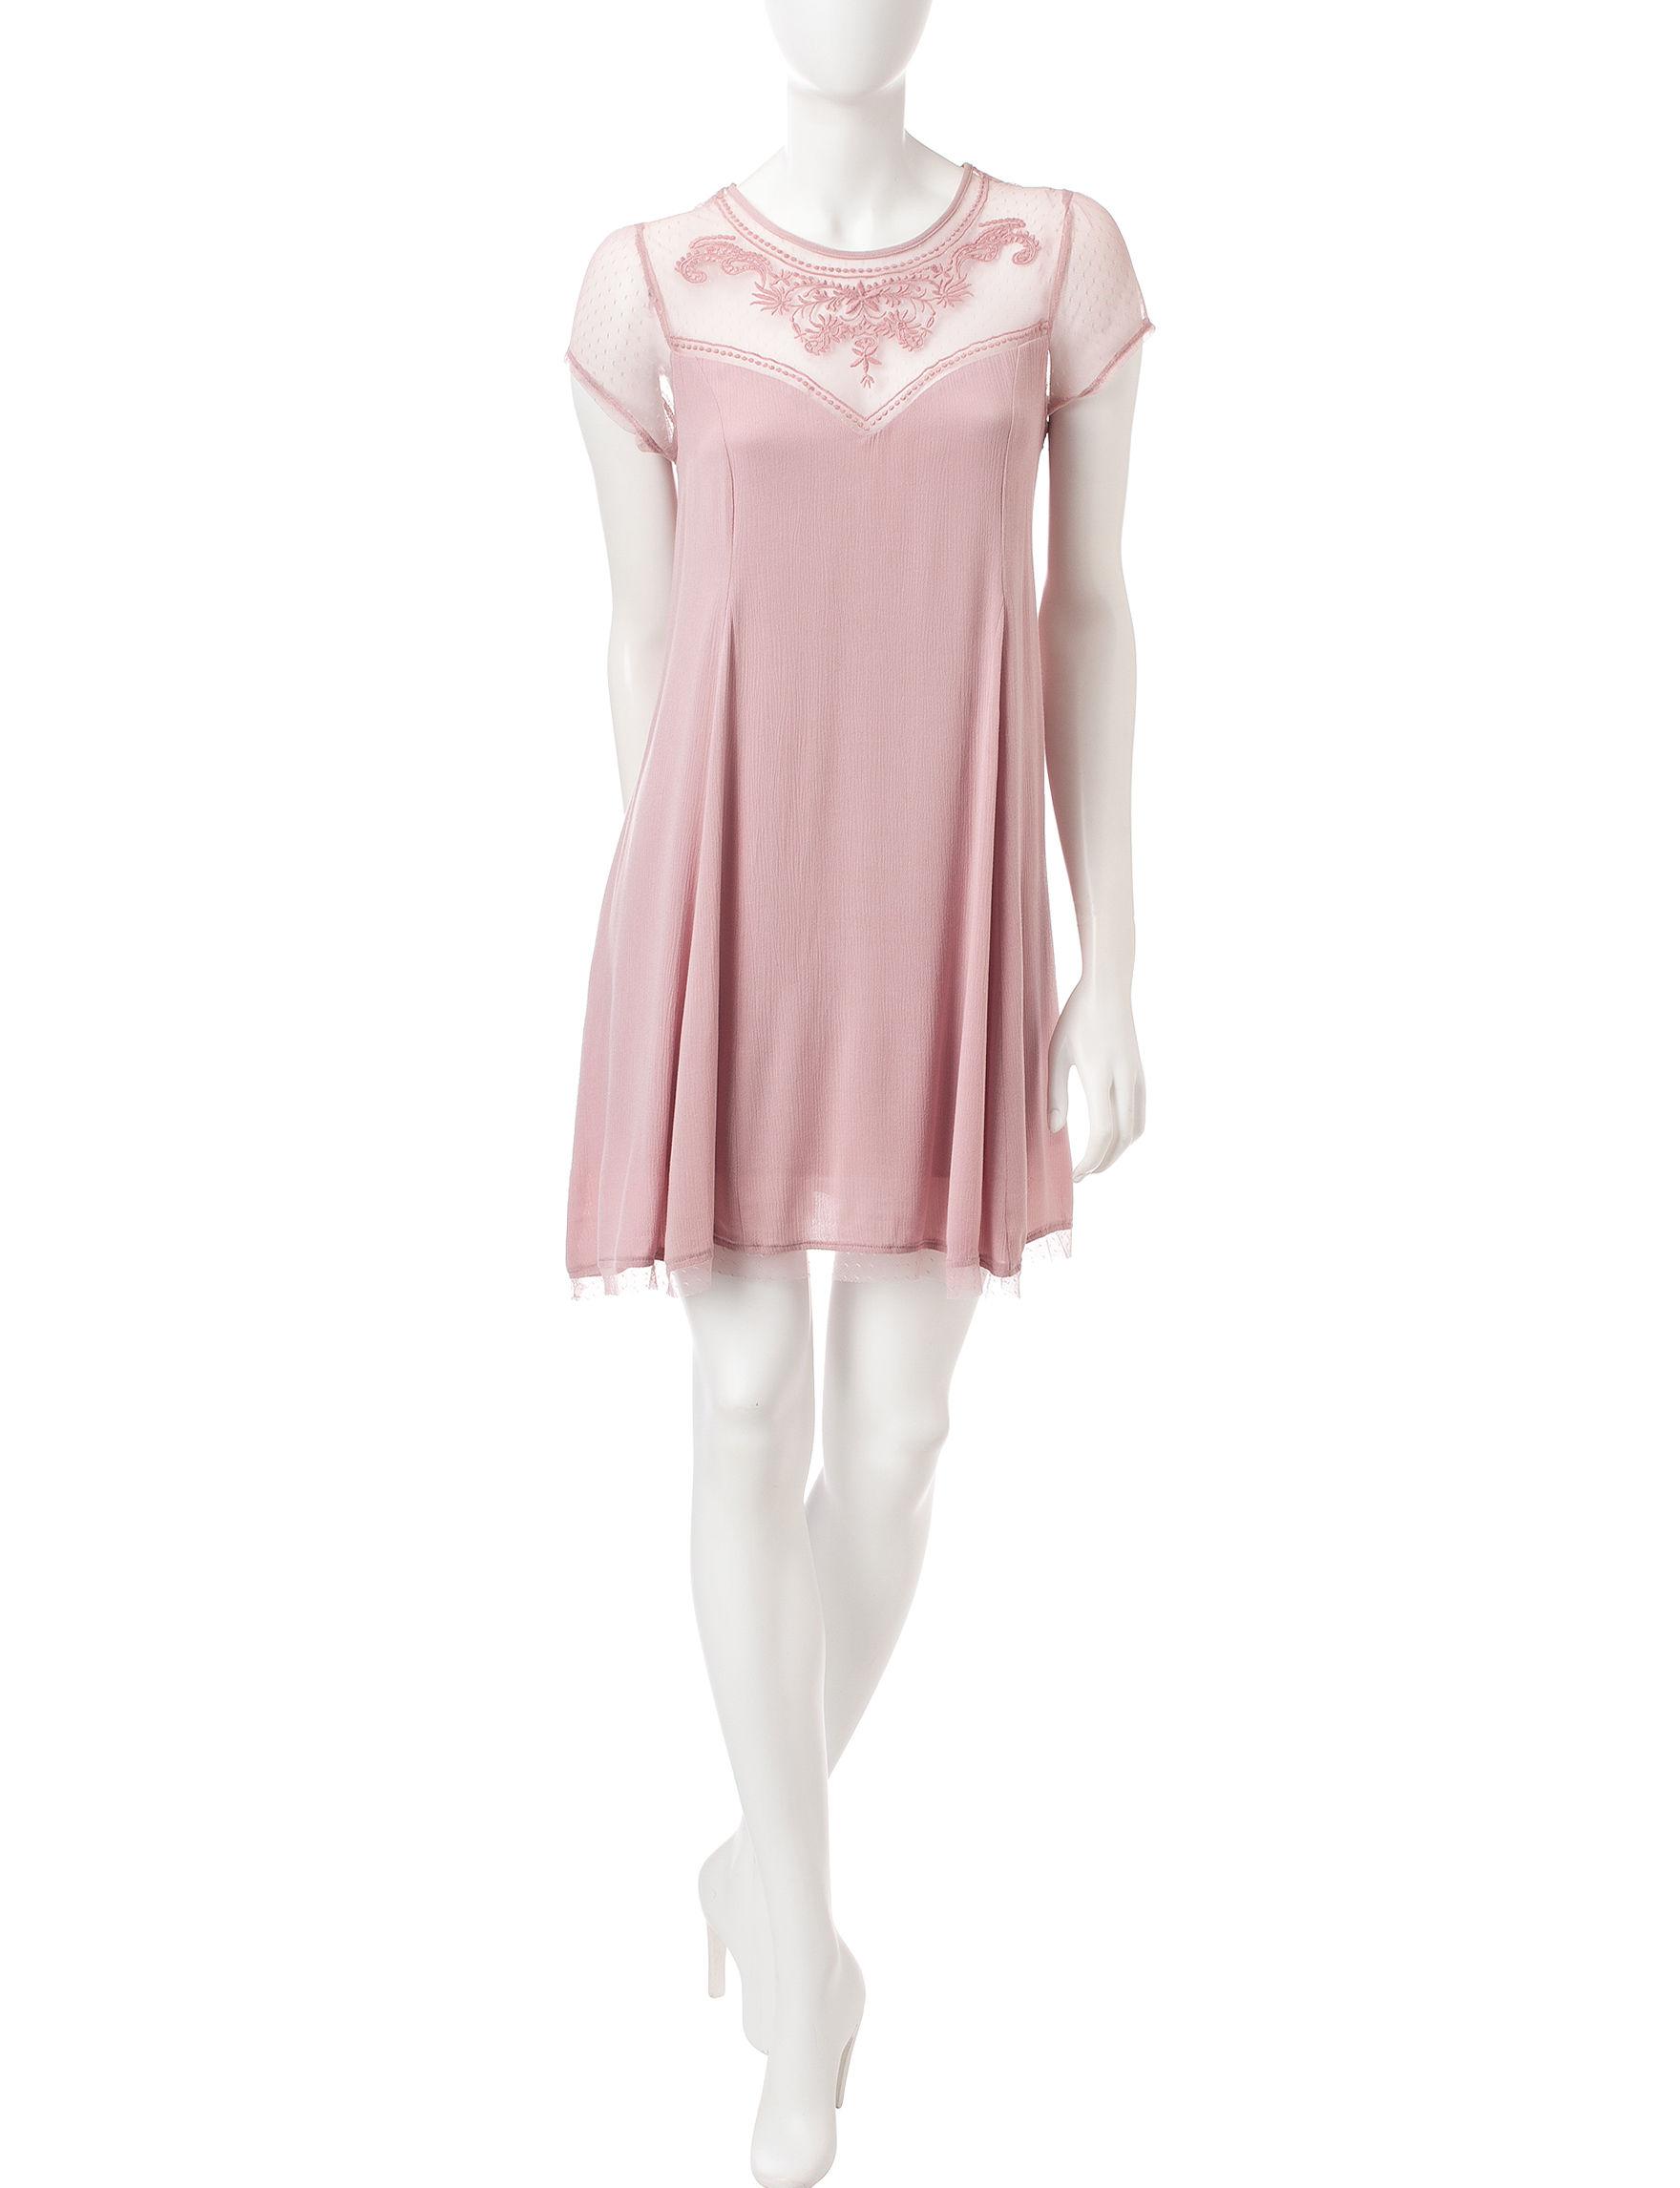 Trixxi Blush Everyday & Casual Shift Dresses